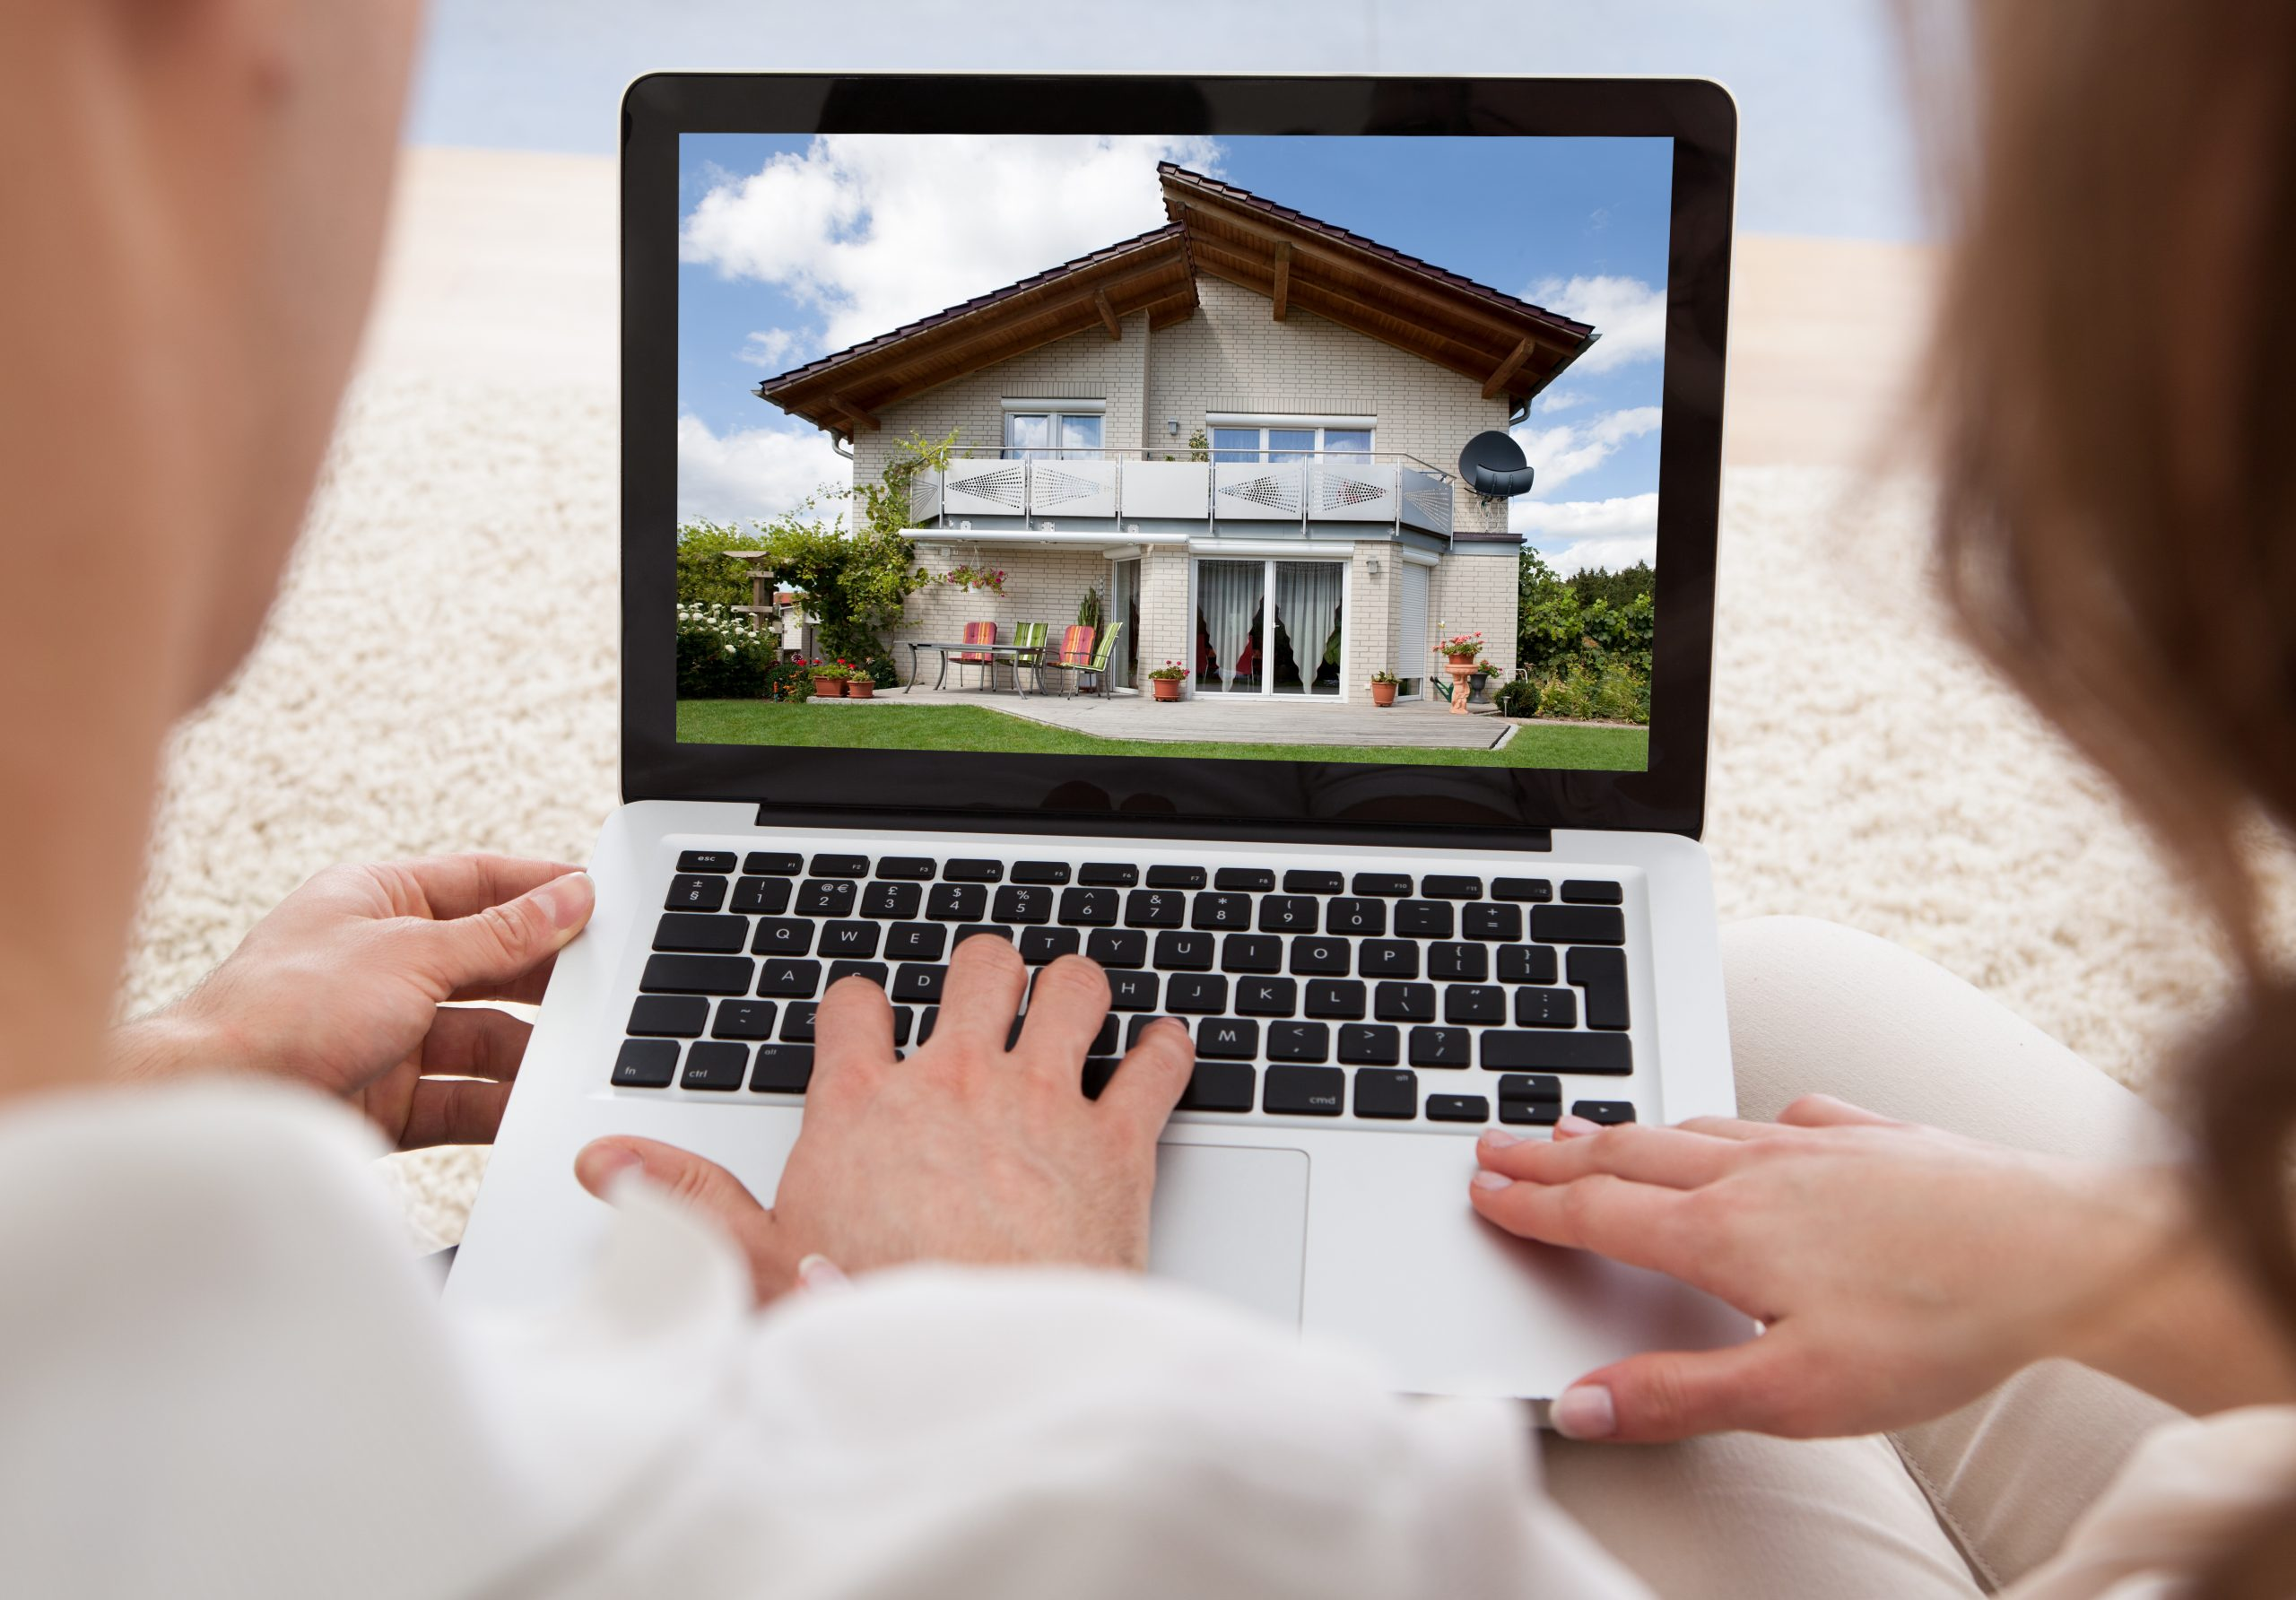 Bozeman Real Estate – Common Real Estate Questions